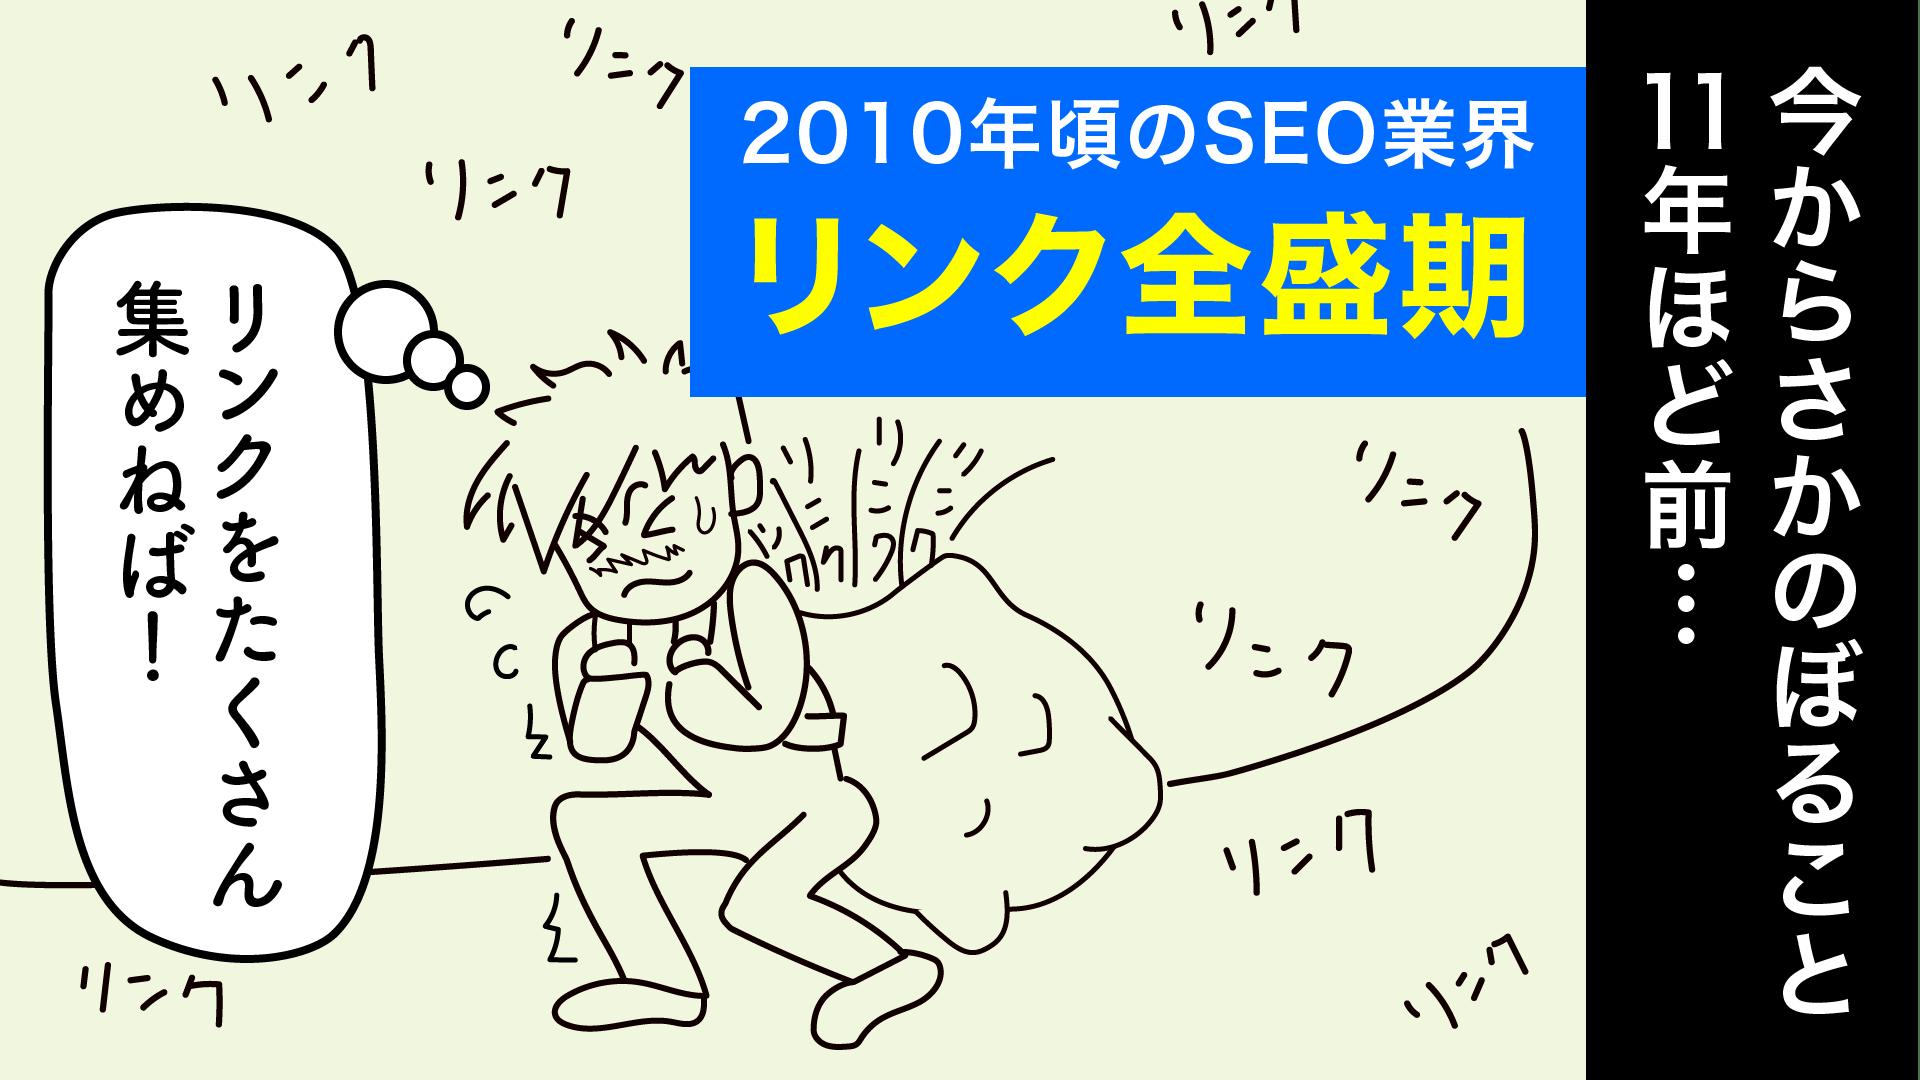 SEO本当にあった事件簿4②